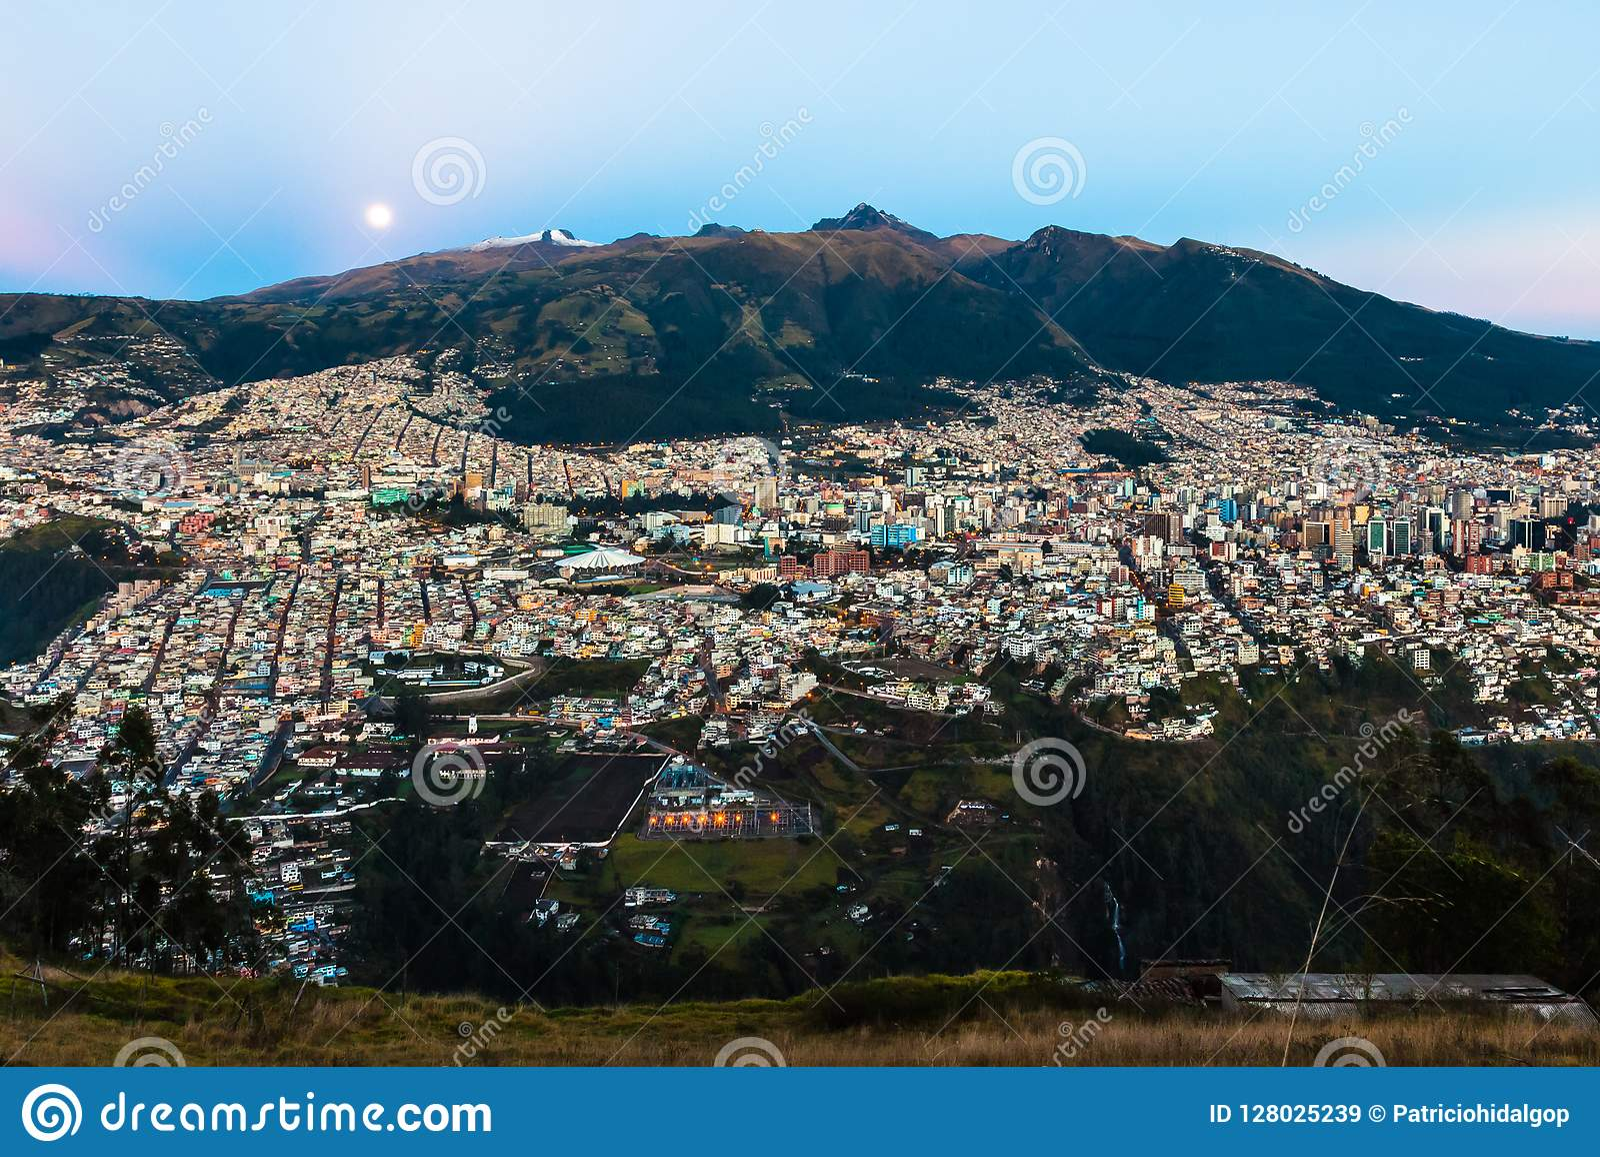 Quito, capital de Ecuador